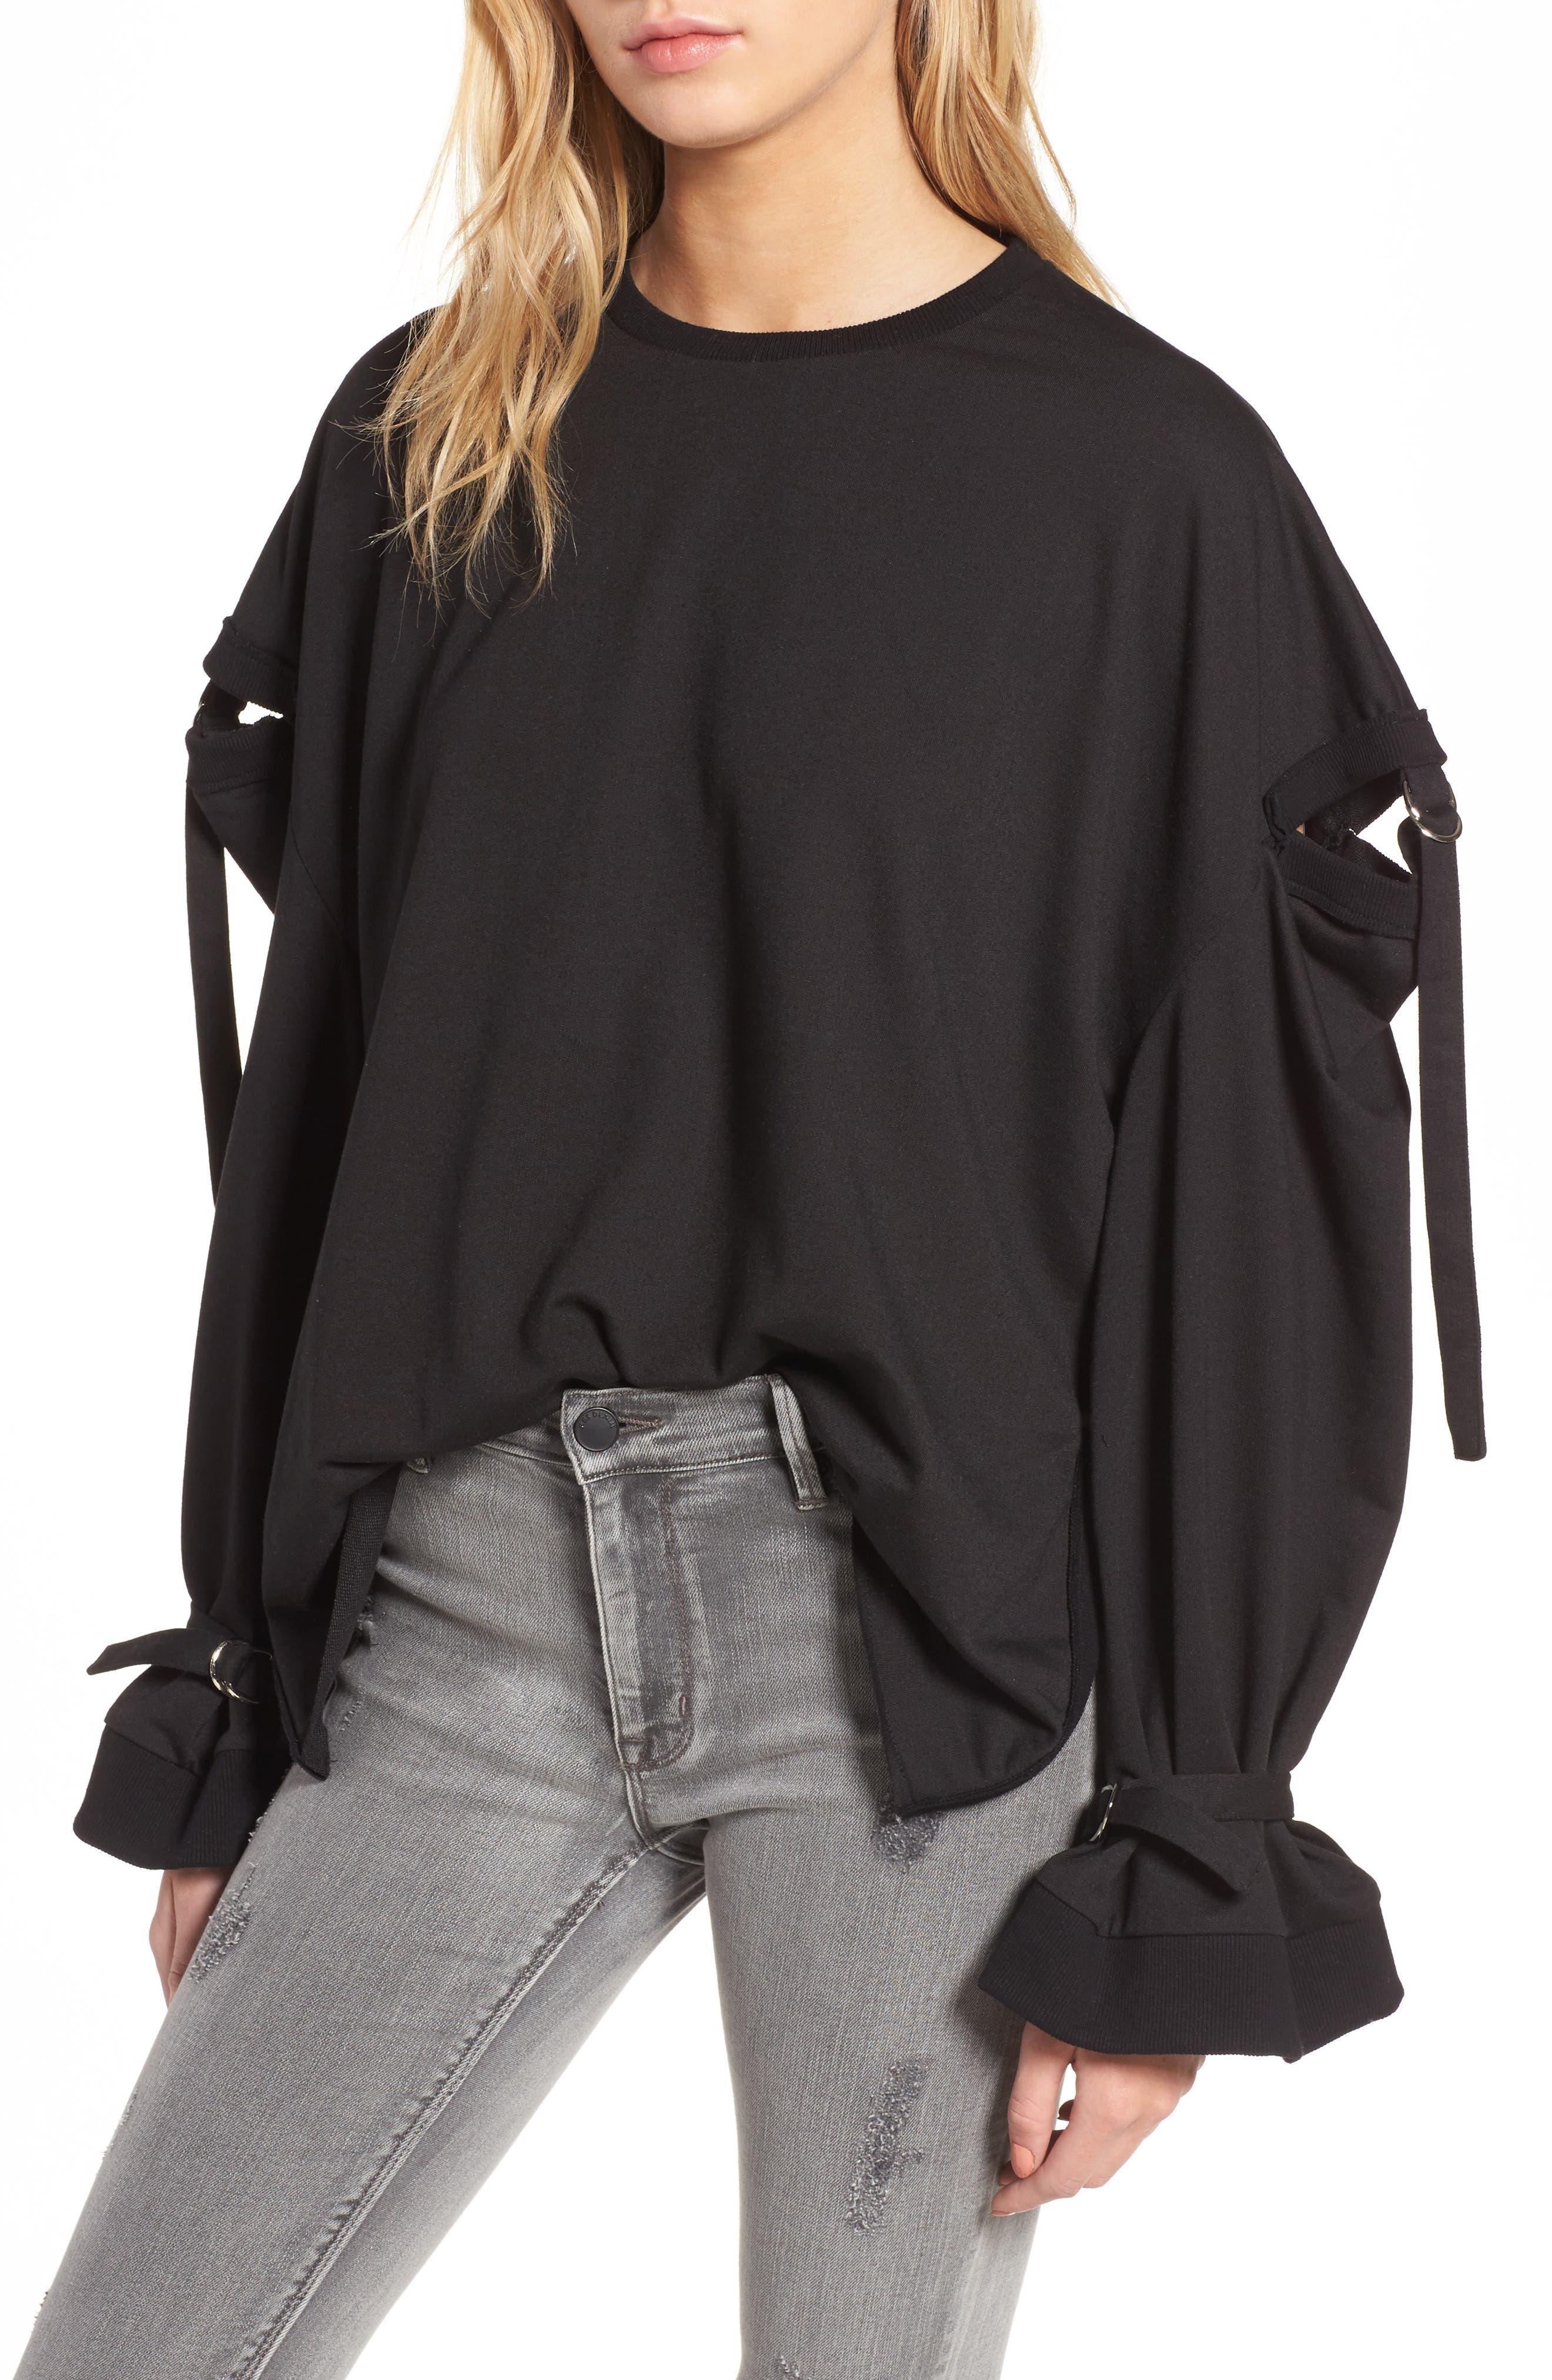 Alternate Image 1 Selected - J.O.A. Cutout Detail Sweatshirt